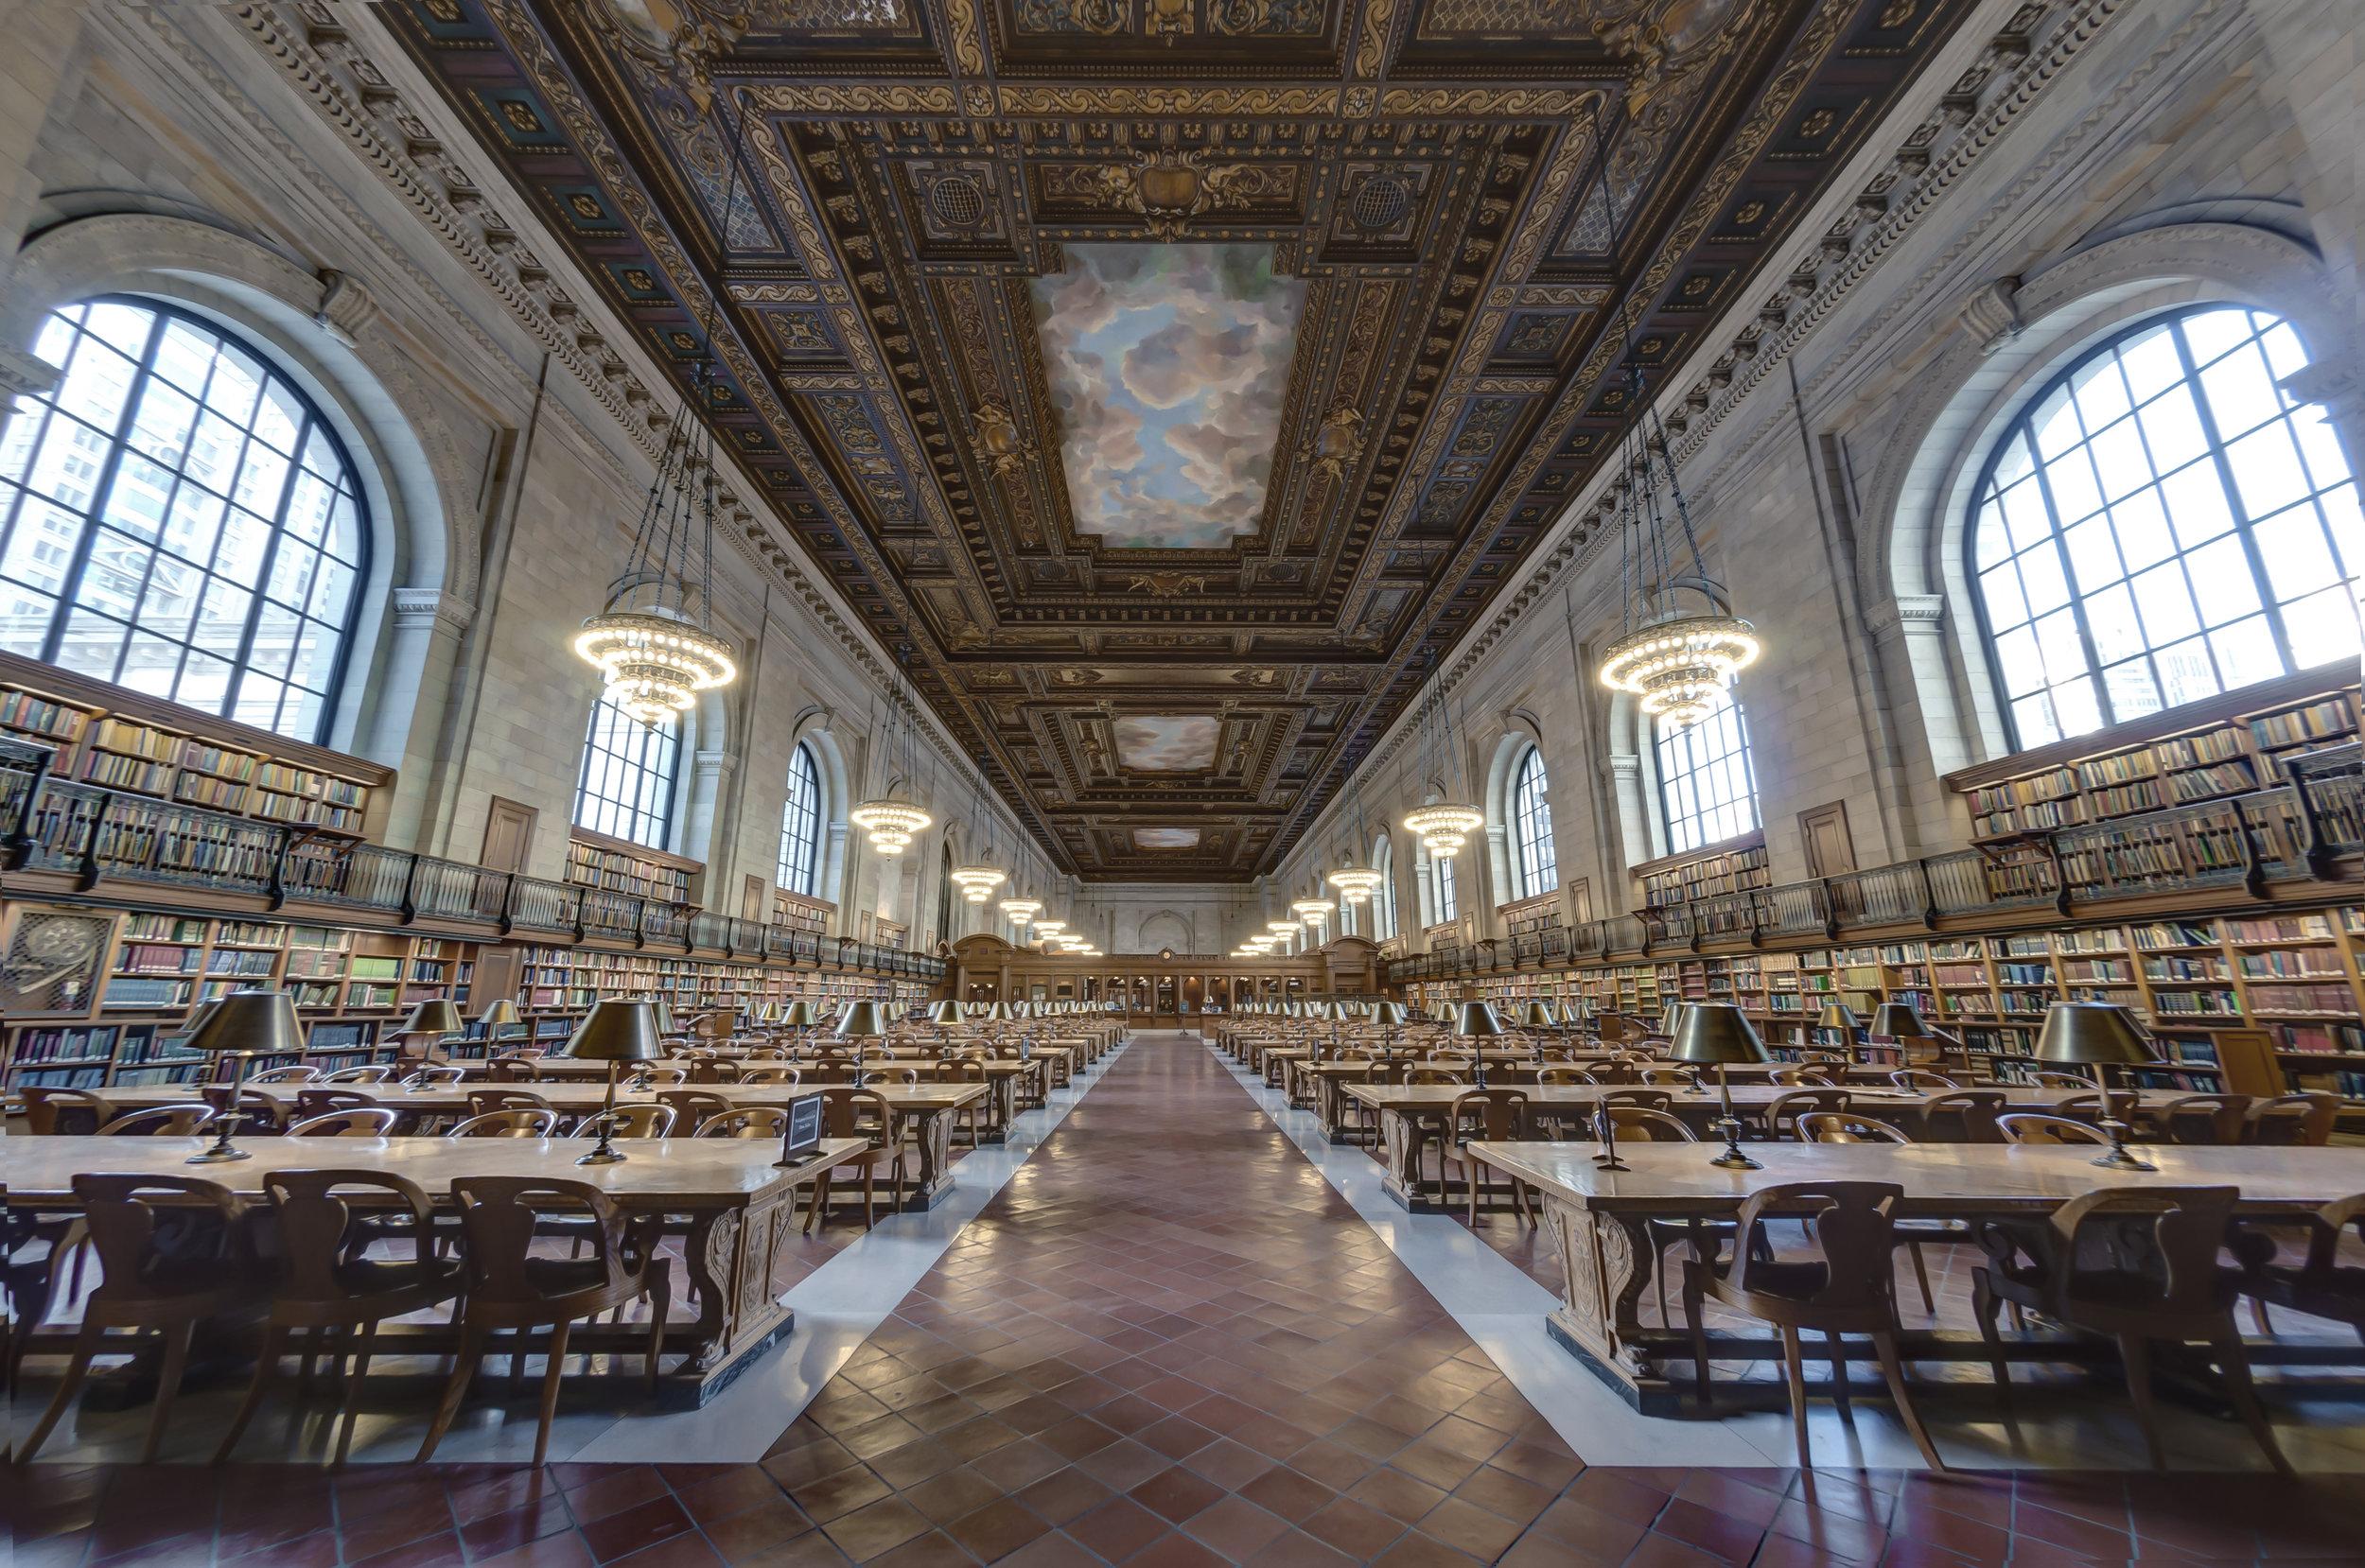 New York Public Library Main Reading Room